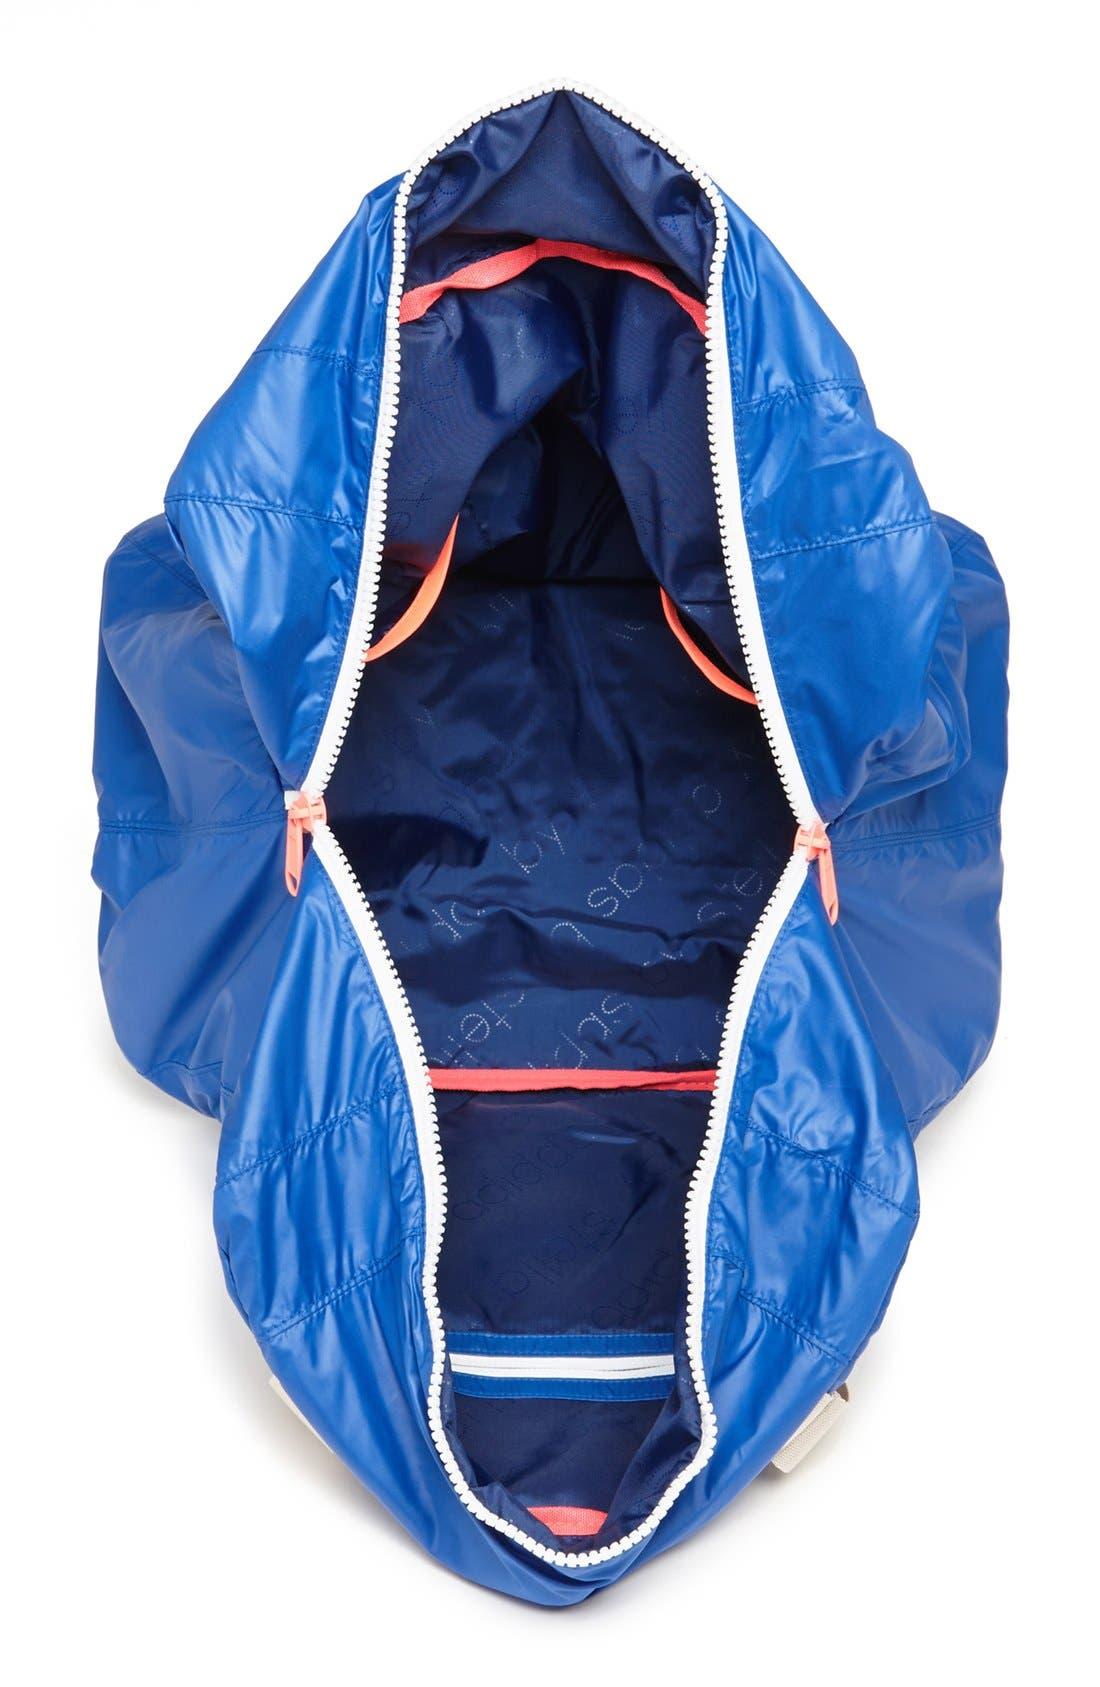 Alternate Image 3  - adidas by Stella McCartney 'Big Carry On' Bag